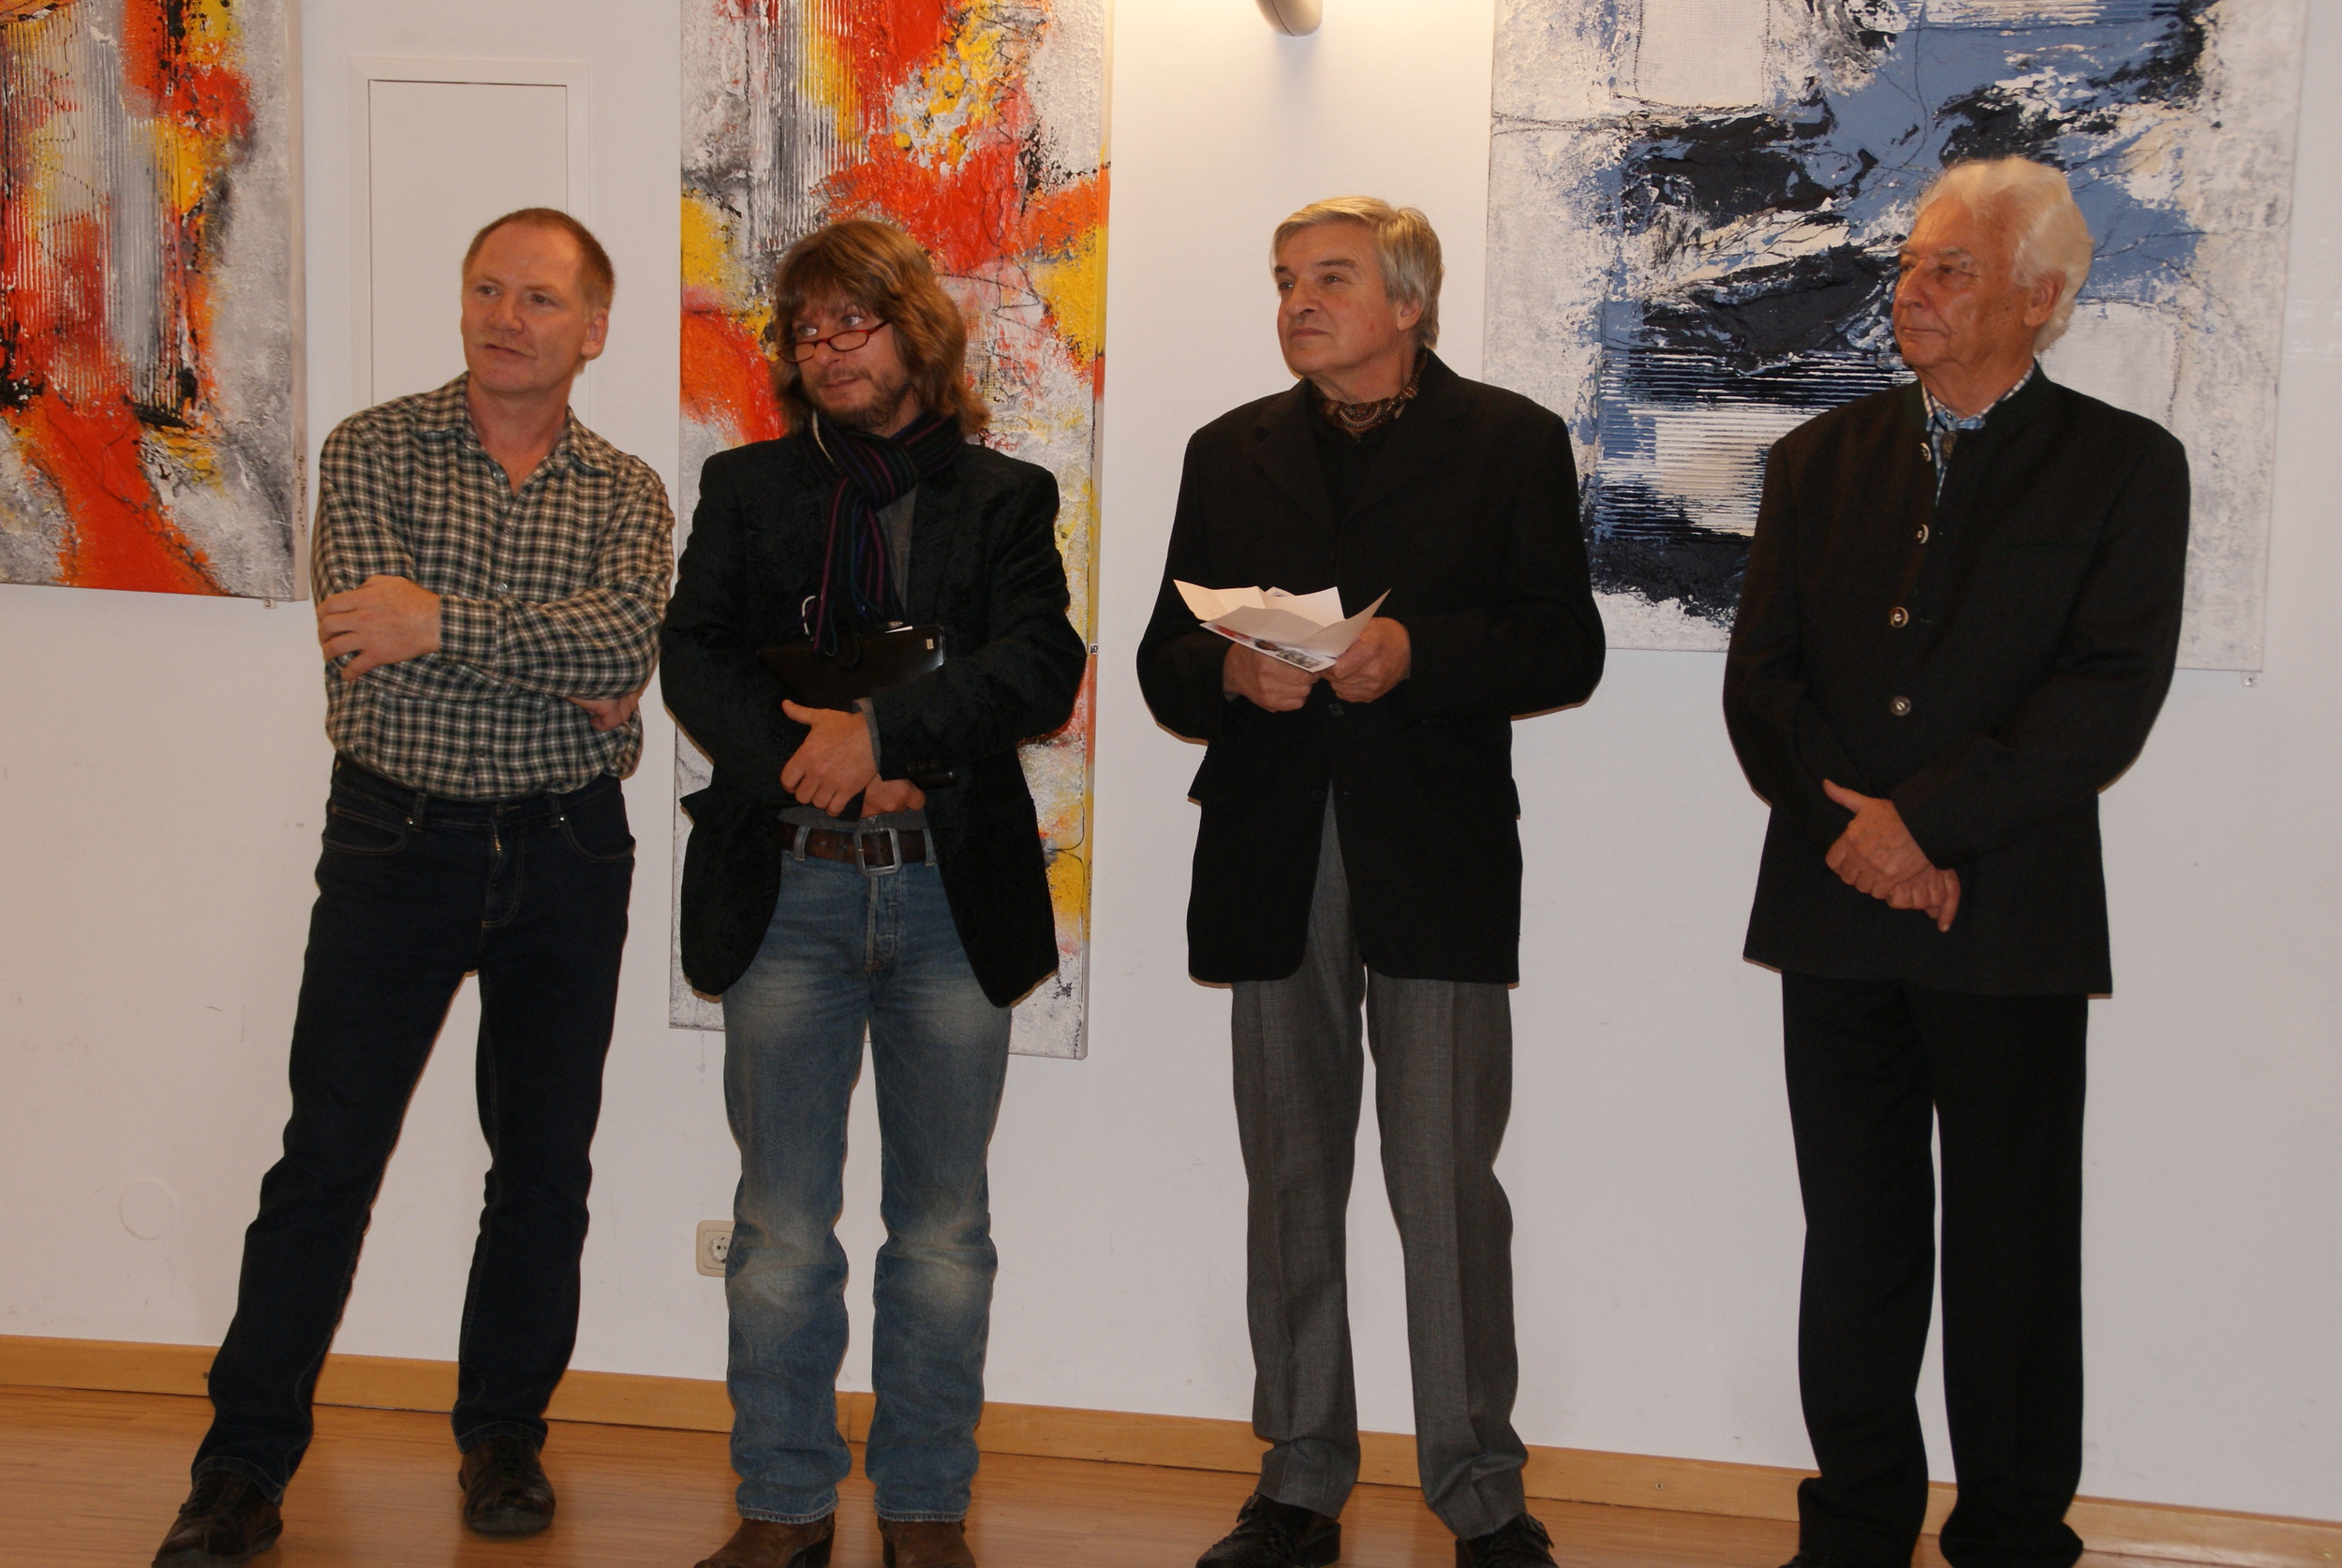 Herbstausstellung 3 Künstler + Eröffner.JPG